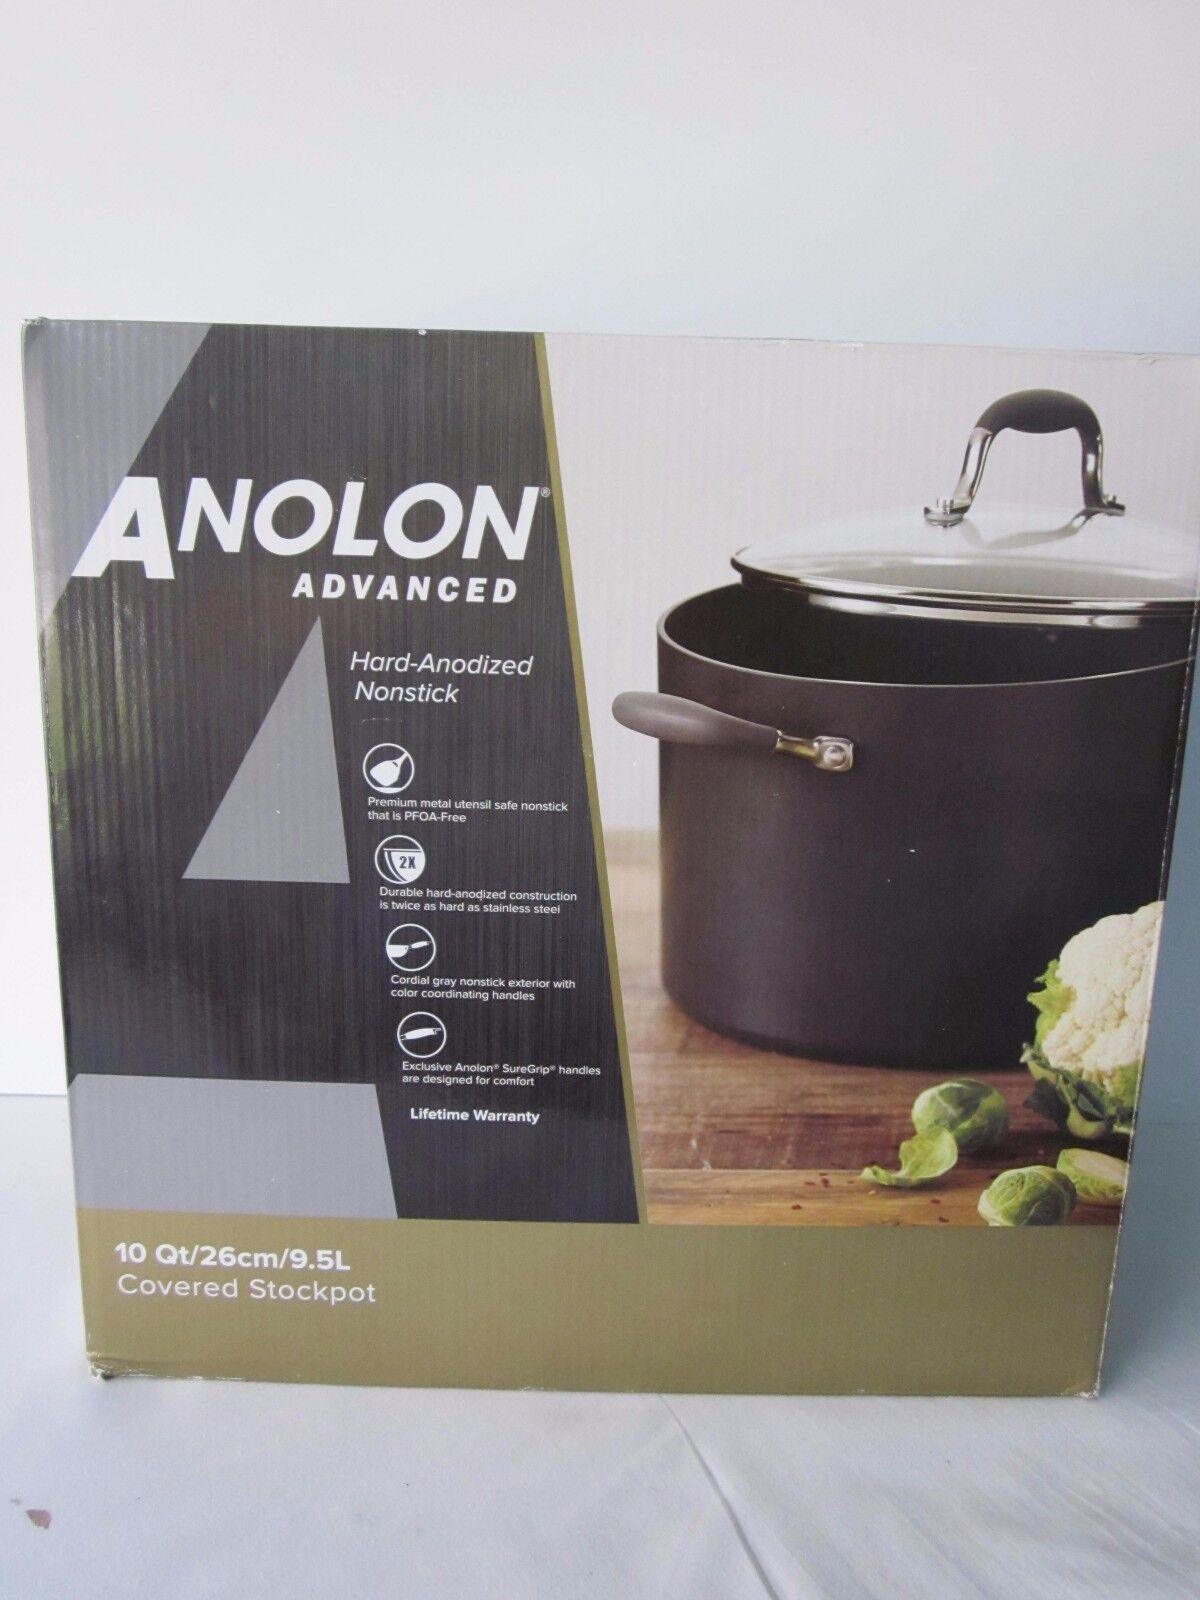 Anolon Advanced 10-Quart Covered Stockpot